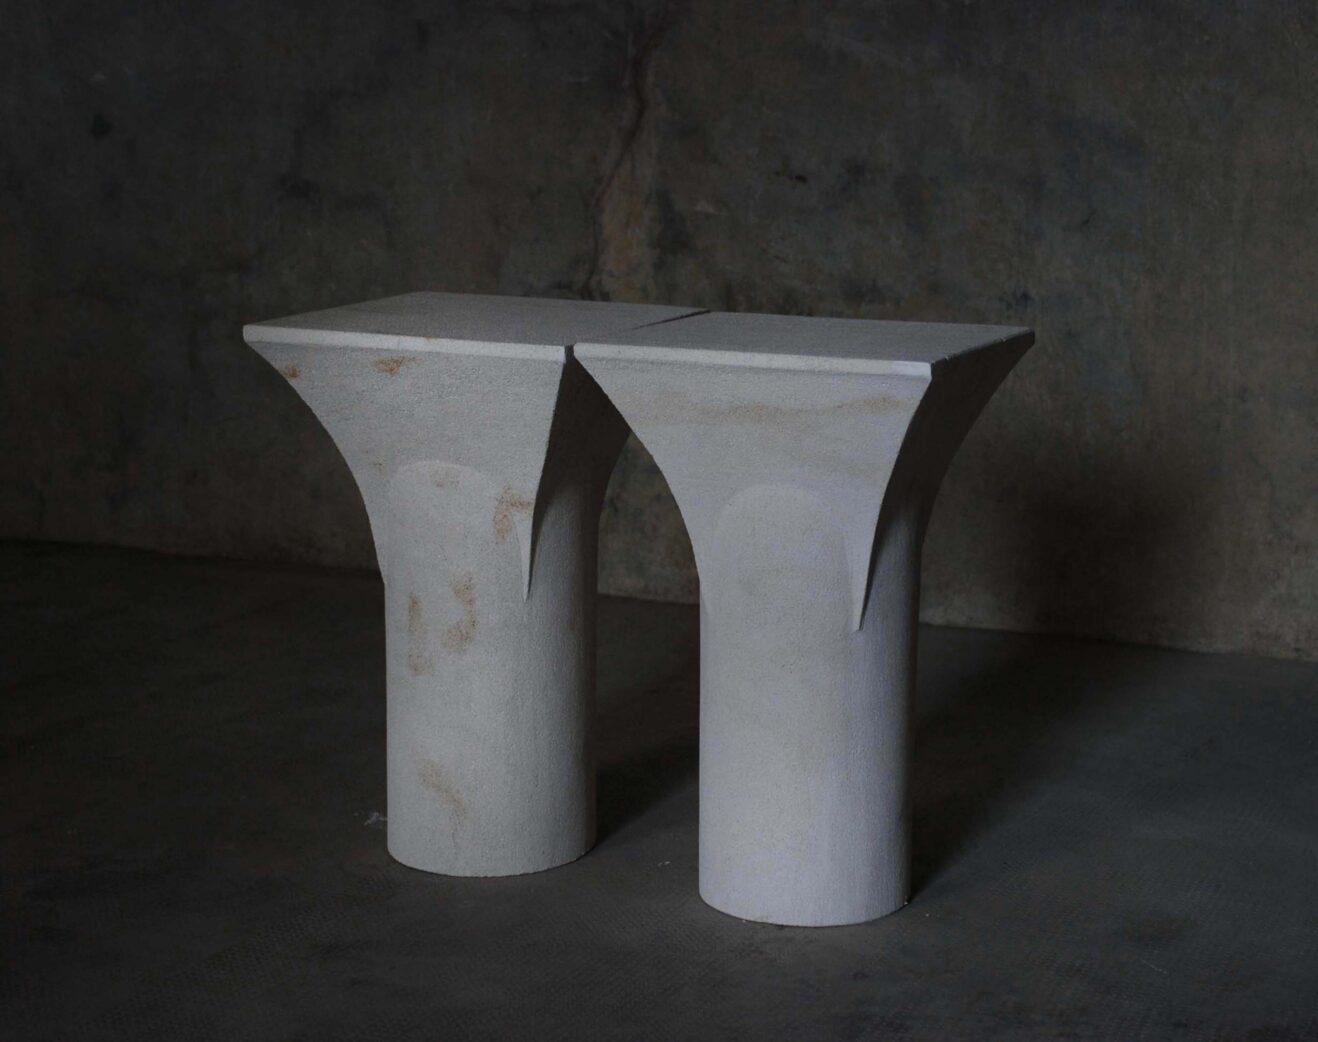 Courtois3-FredericSaulou-SavannahBay-design